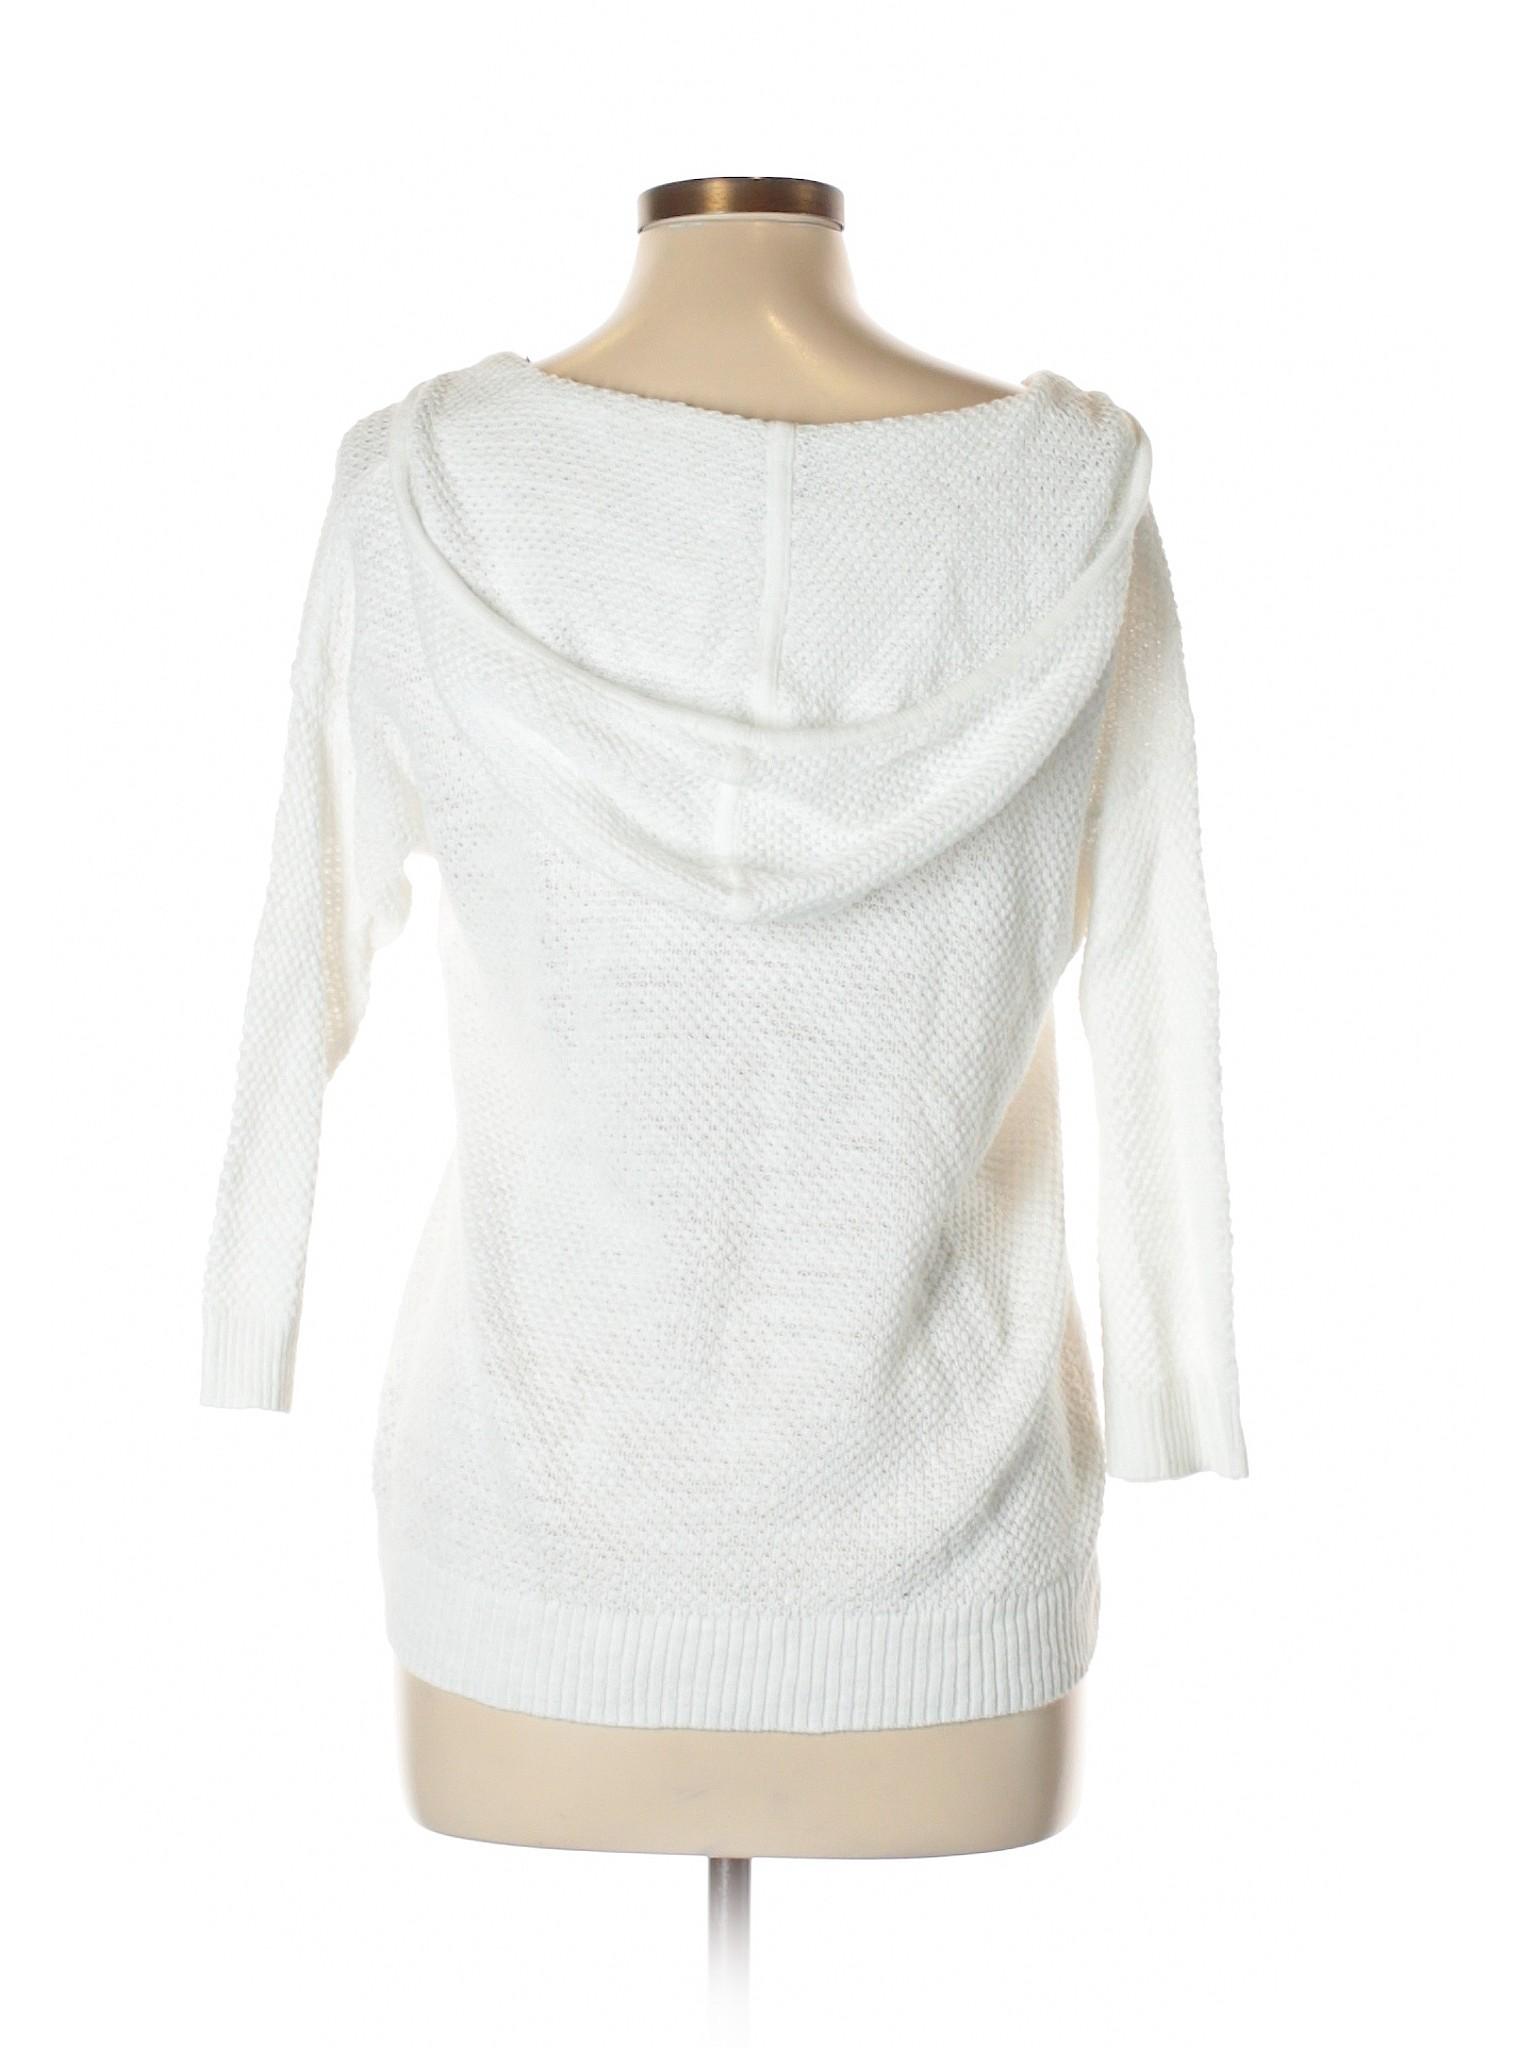 Boutique Gap Pullover Gap Pullover Sweater Sweater Boutique FxB4qwp